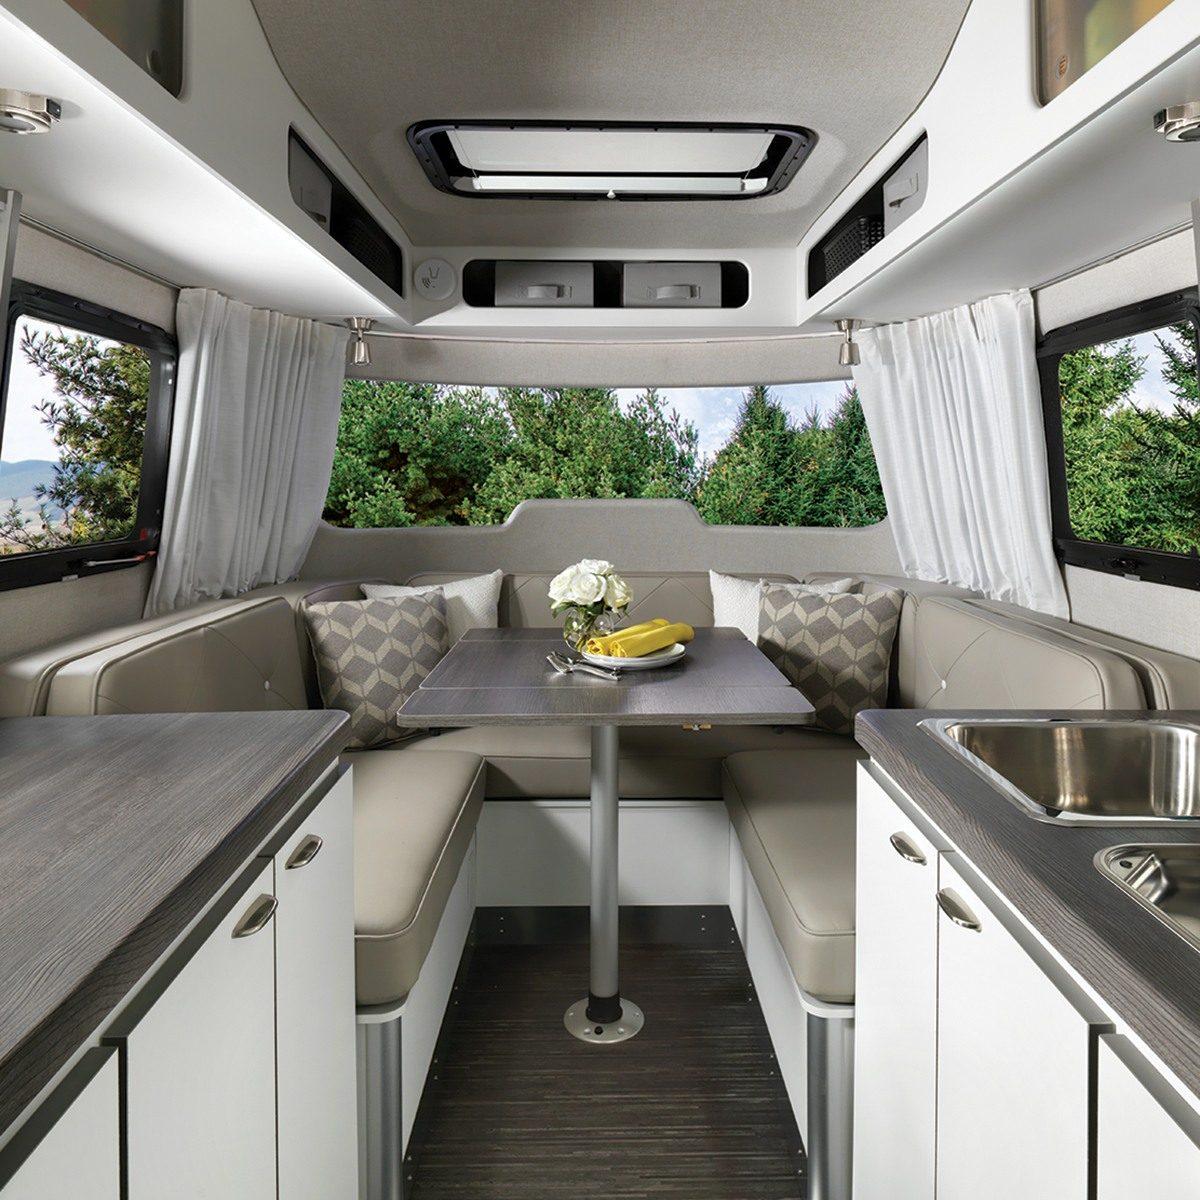 Nest by Airstream interior decor